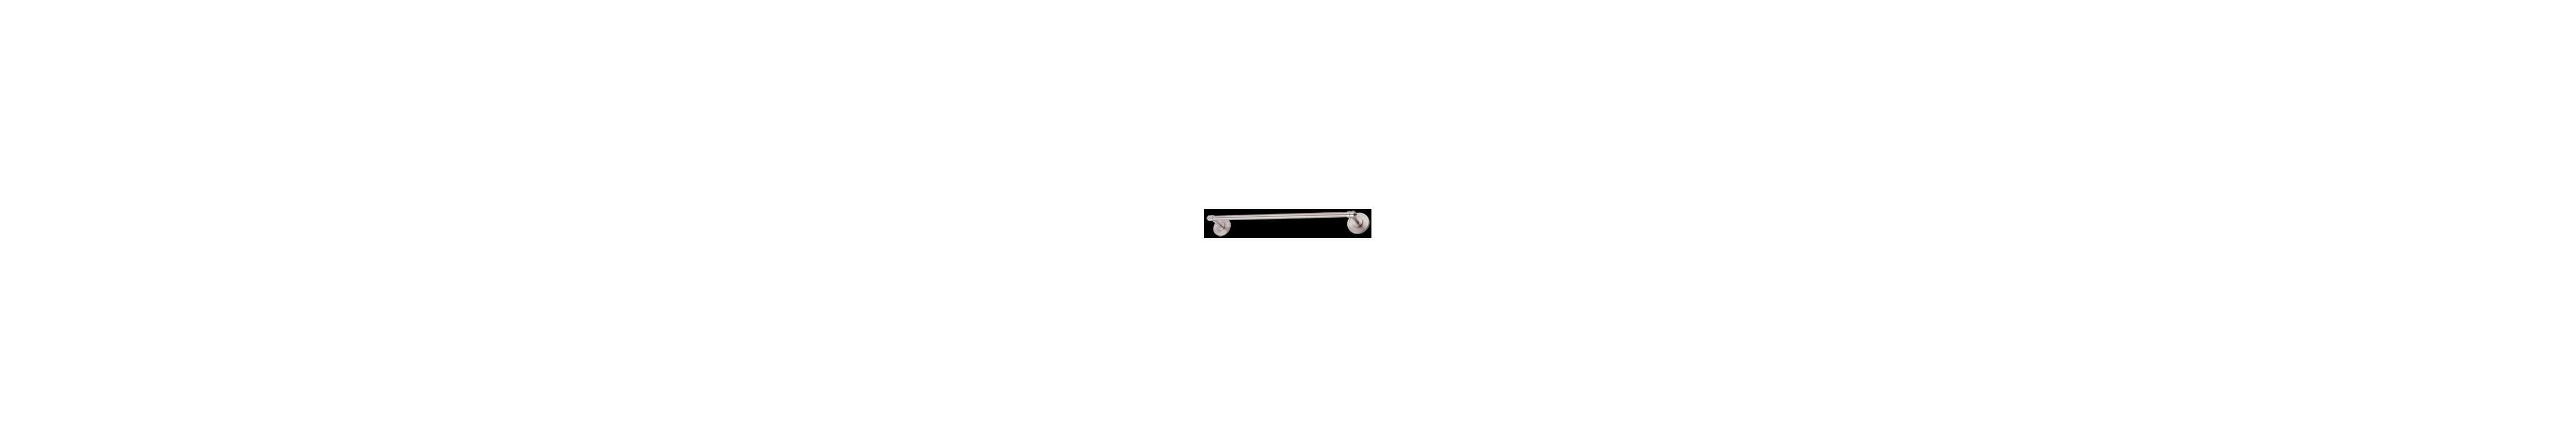 "DVI Lighting DVP3681 2 Light 24"" Towel Bar from the Dominion"